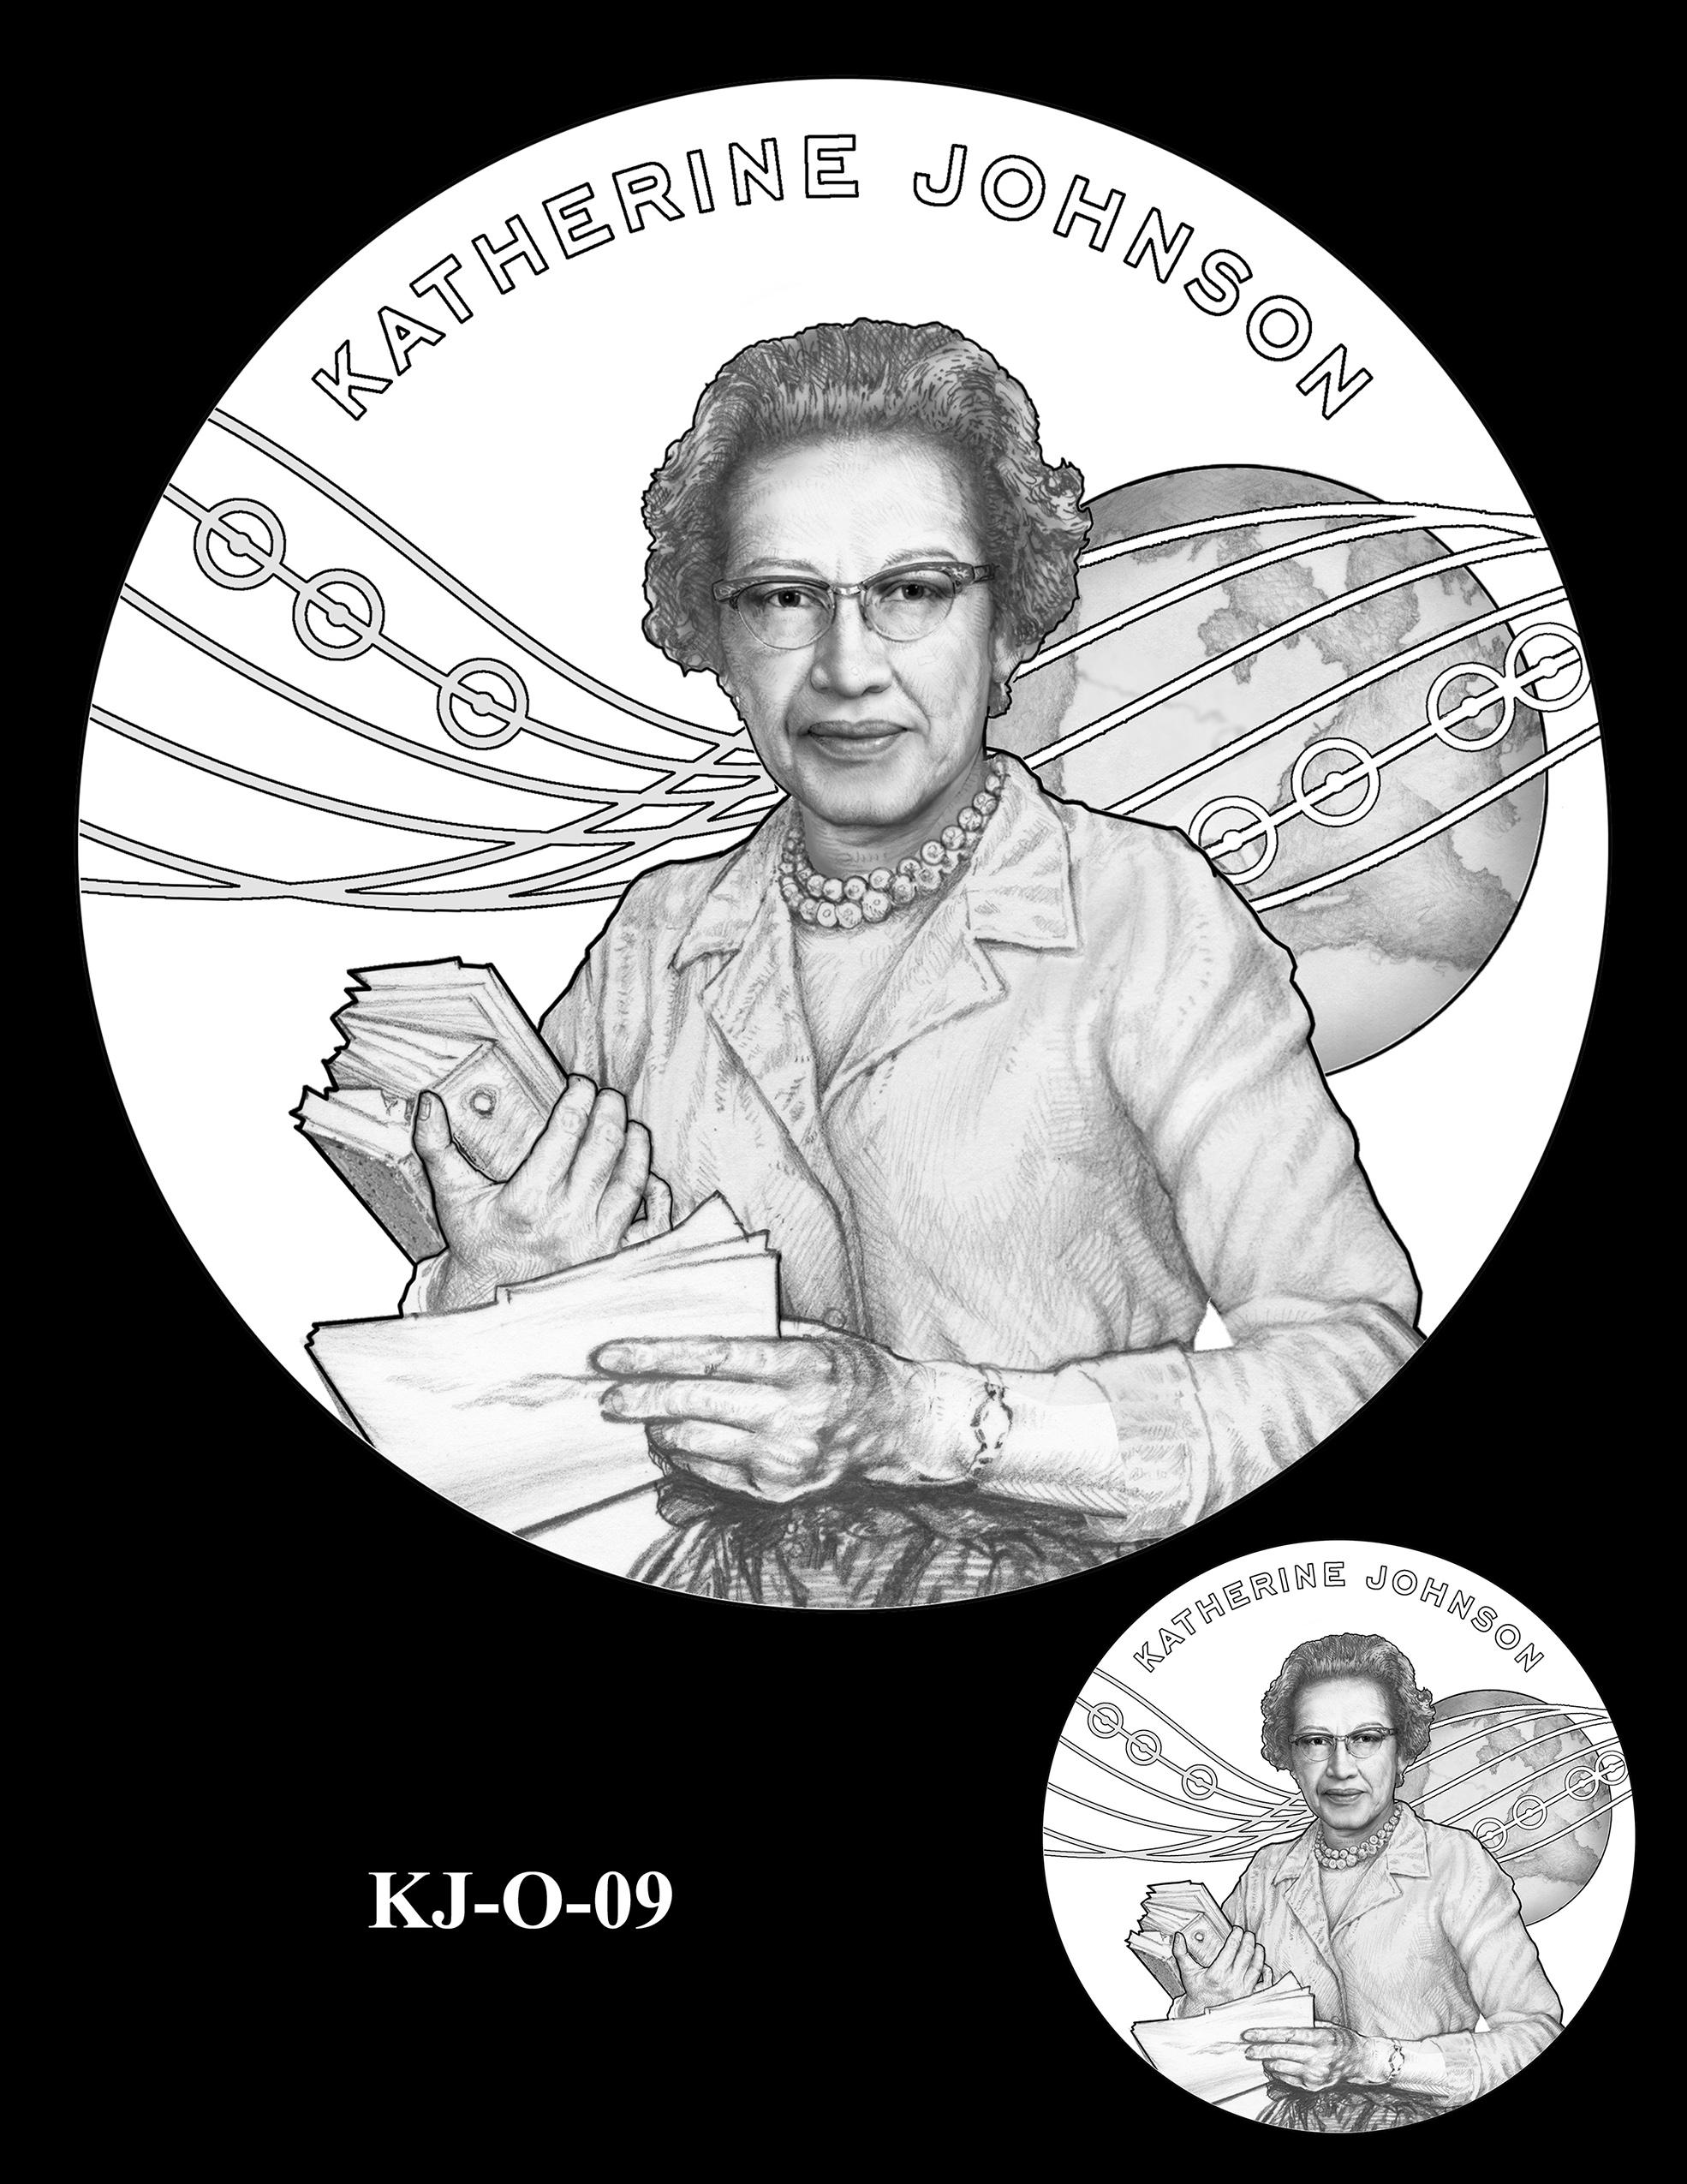 KJ-O-09 -- Katherine Johnson Congressional Gold Medal